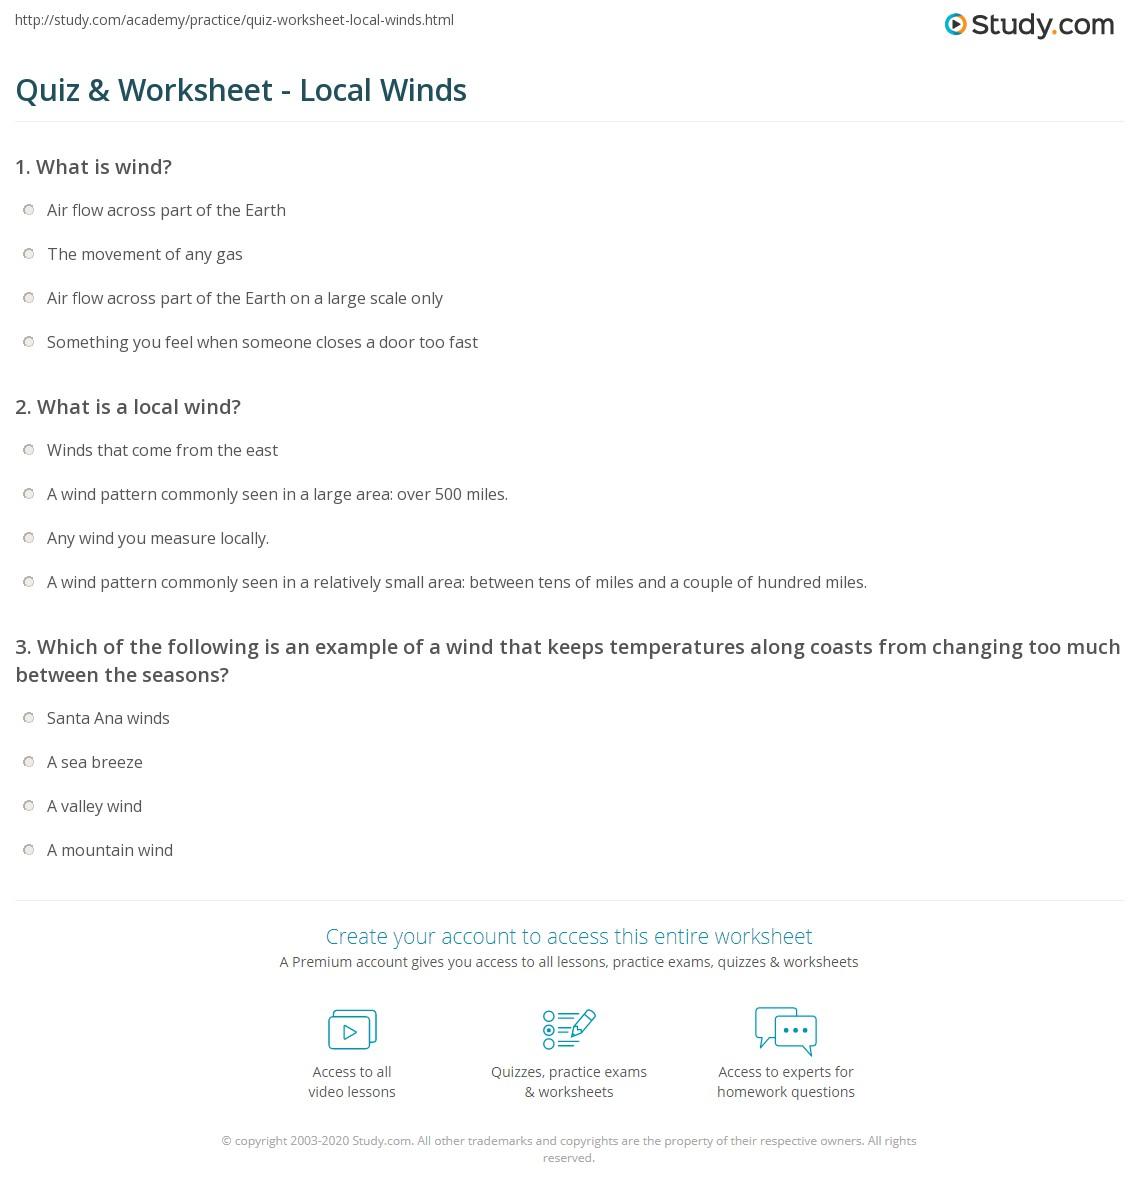 worksheet Global Wind Patterns Worksheet global wind patterns worksheet free worksheets library download quiz w ksheet loc l ds study